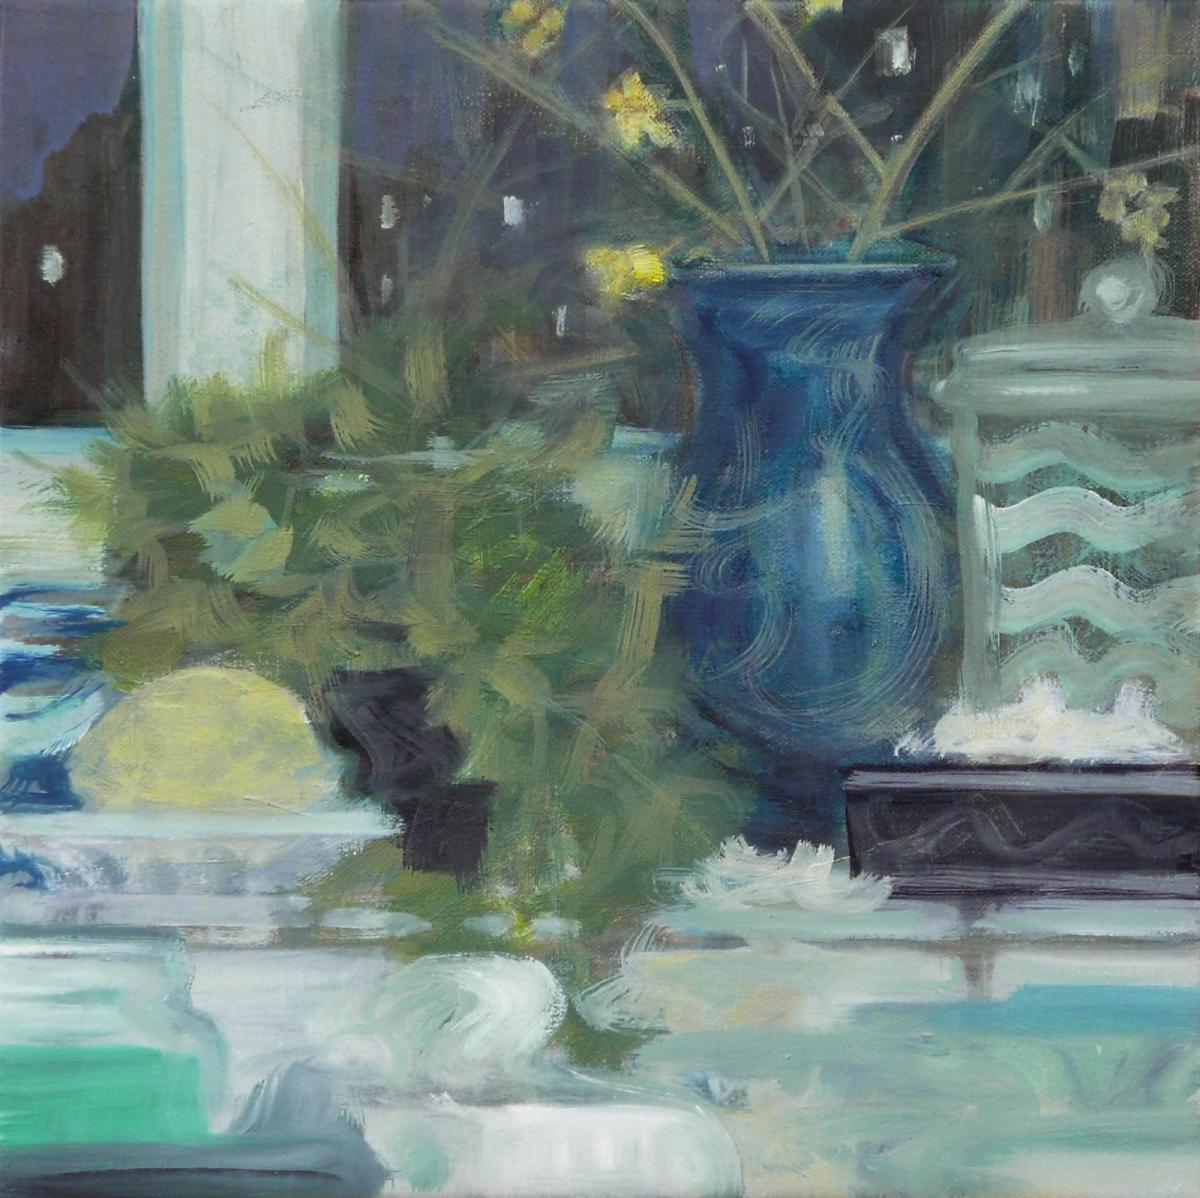 oil painting by Rebecca Payn, 'Kitchen Window' (iii)